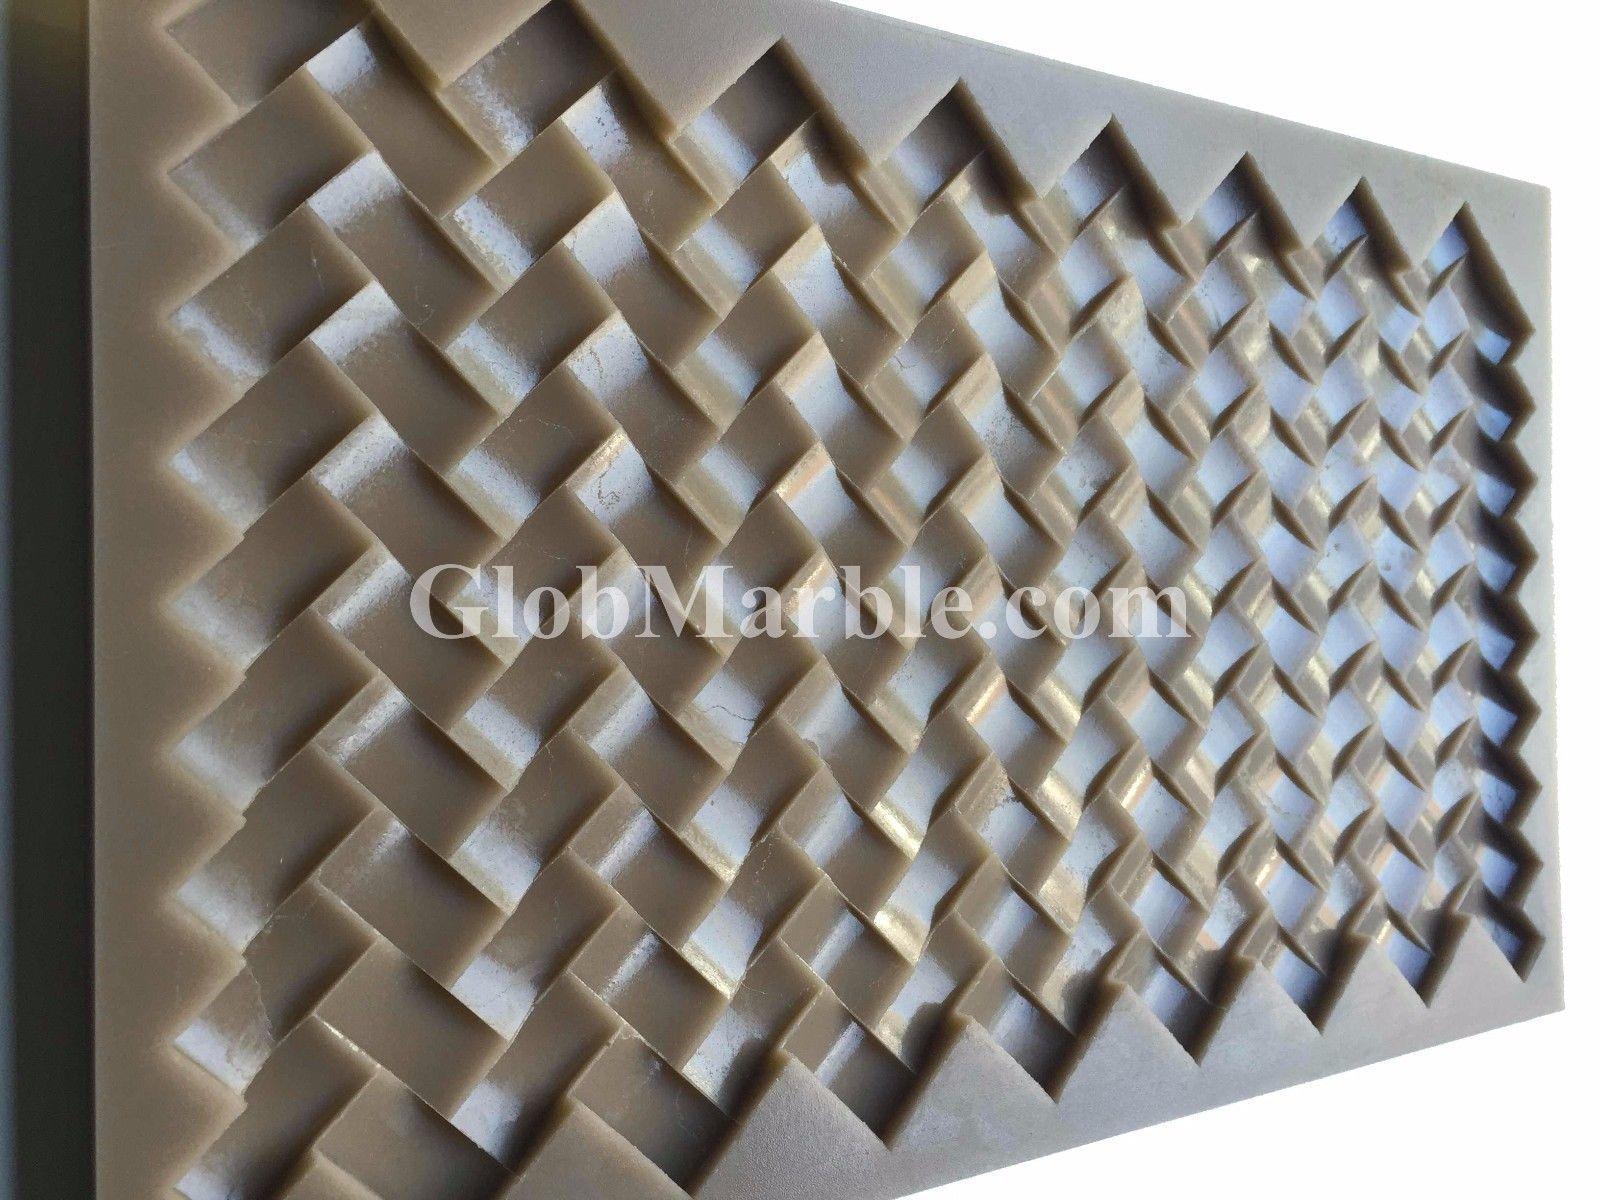 Betonstein Gussform Faltig Mosaik Kachel And 50 Similar Items